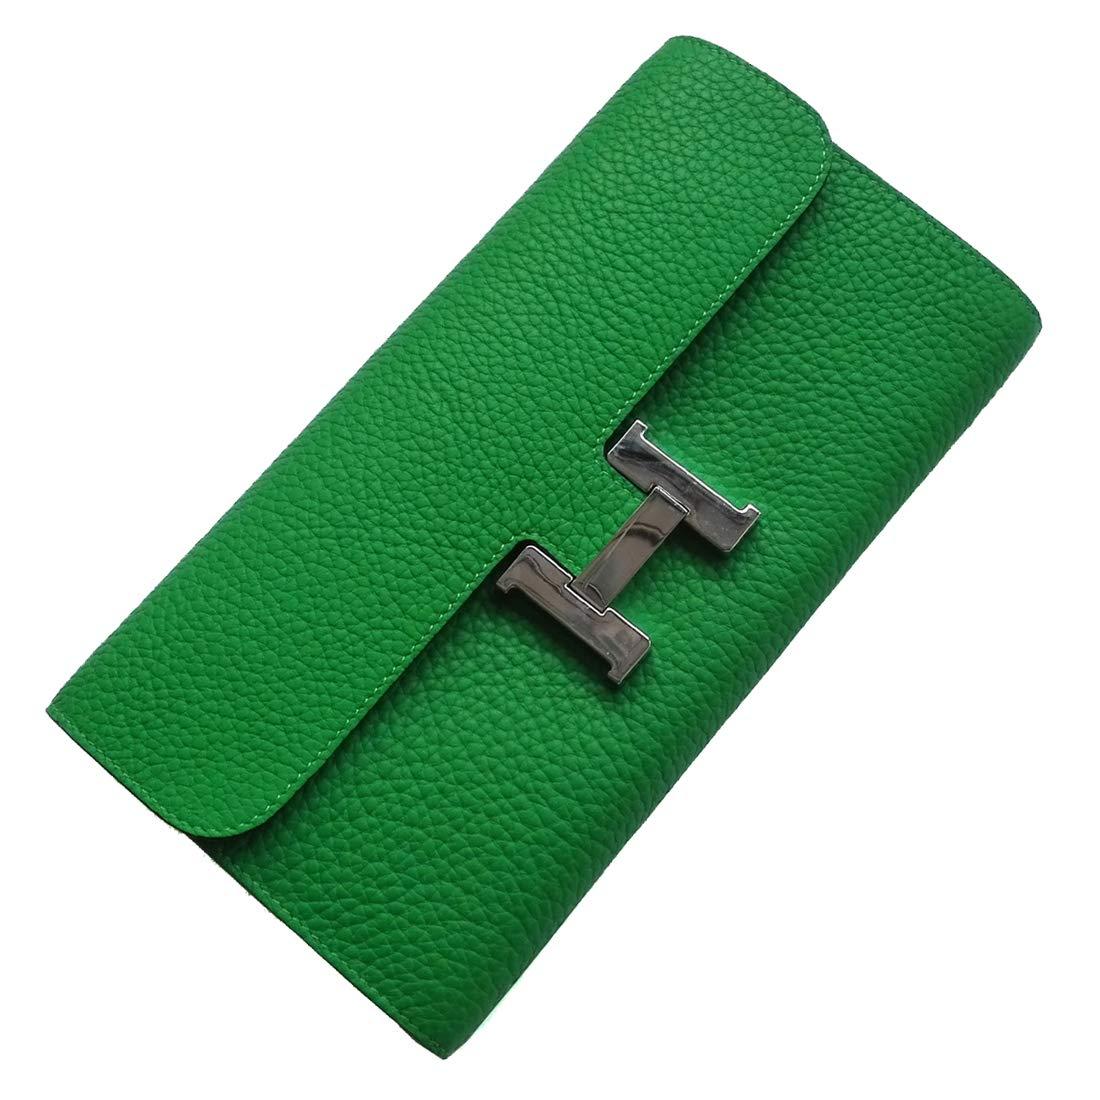 F.BLUE Cowhide Women 's Long Wallet Envelope Package FB022 (Green)